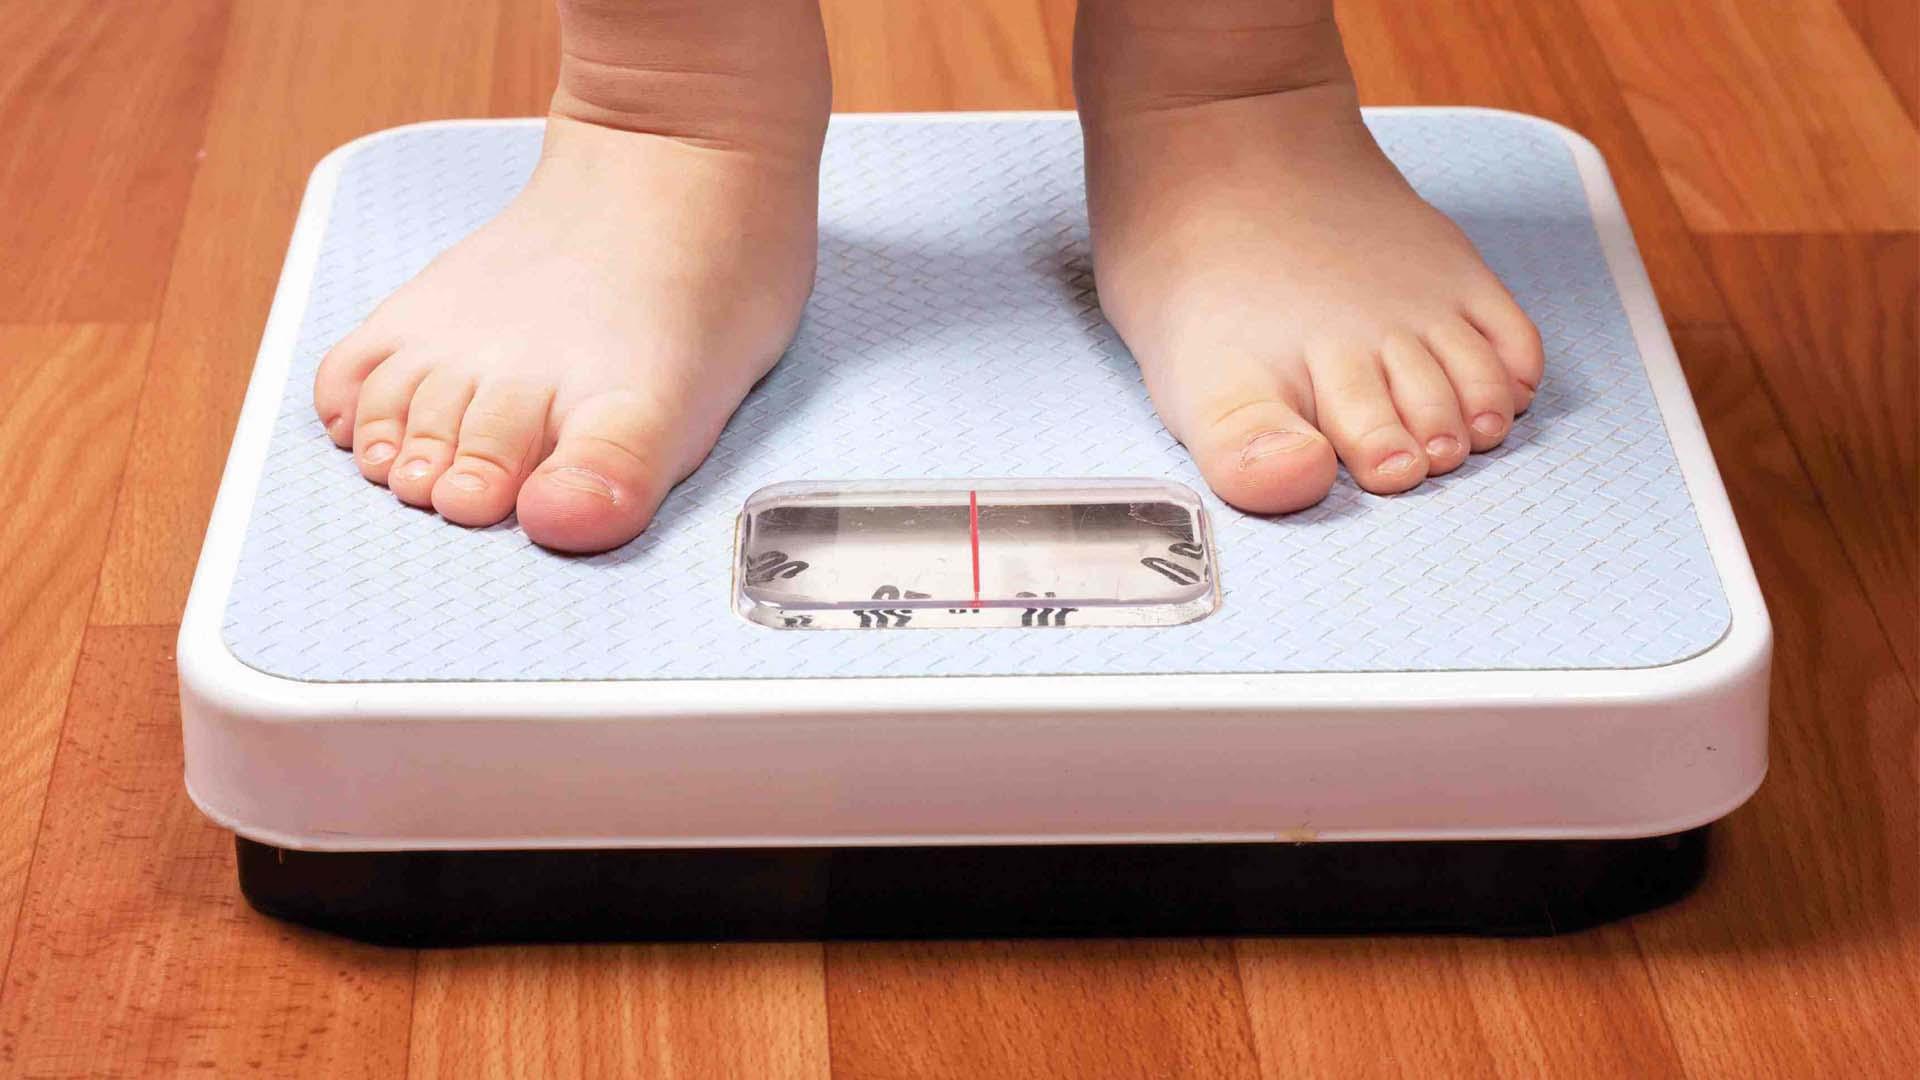 Analizar la flora bucal ayuda a detectar la obesidad infantil